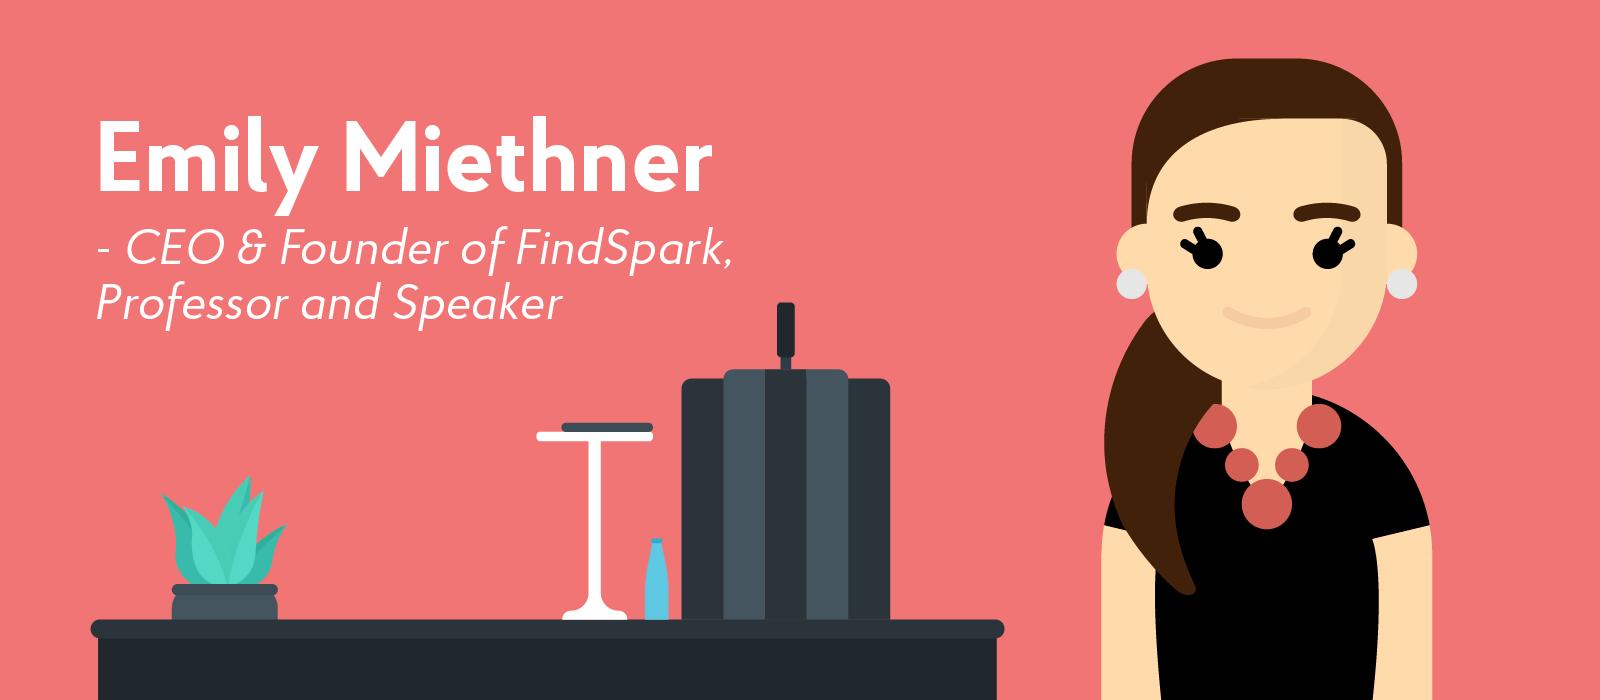 Emily Miethner career influencer